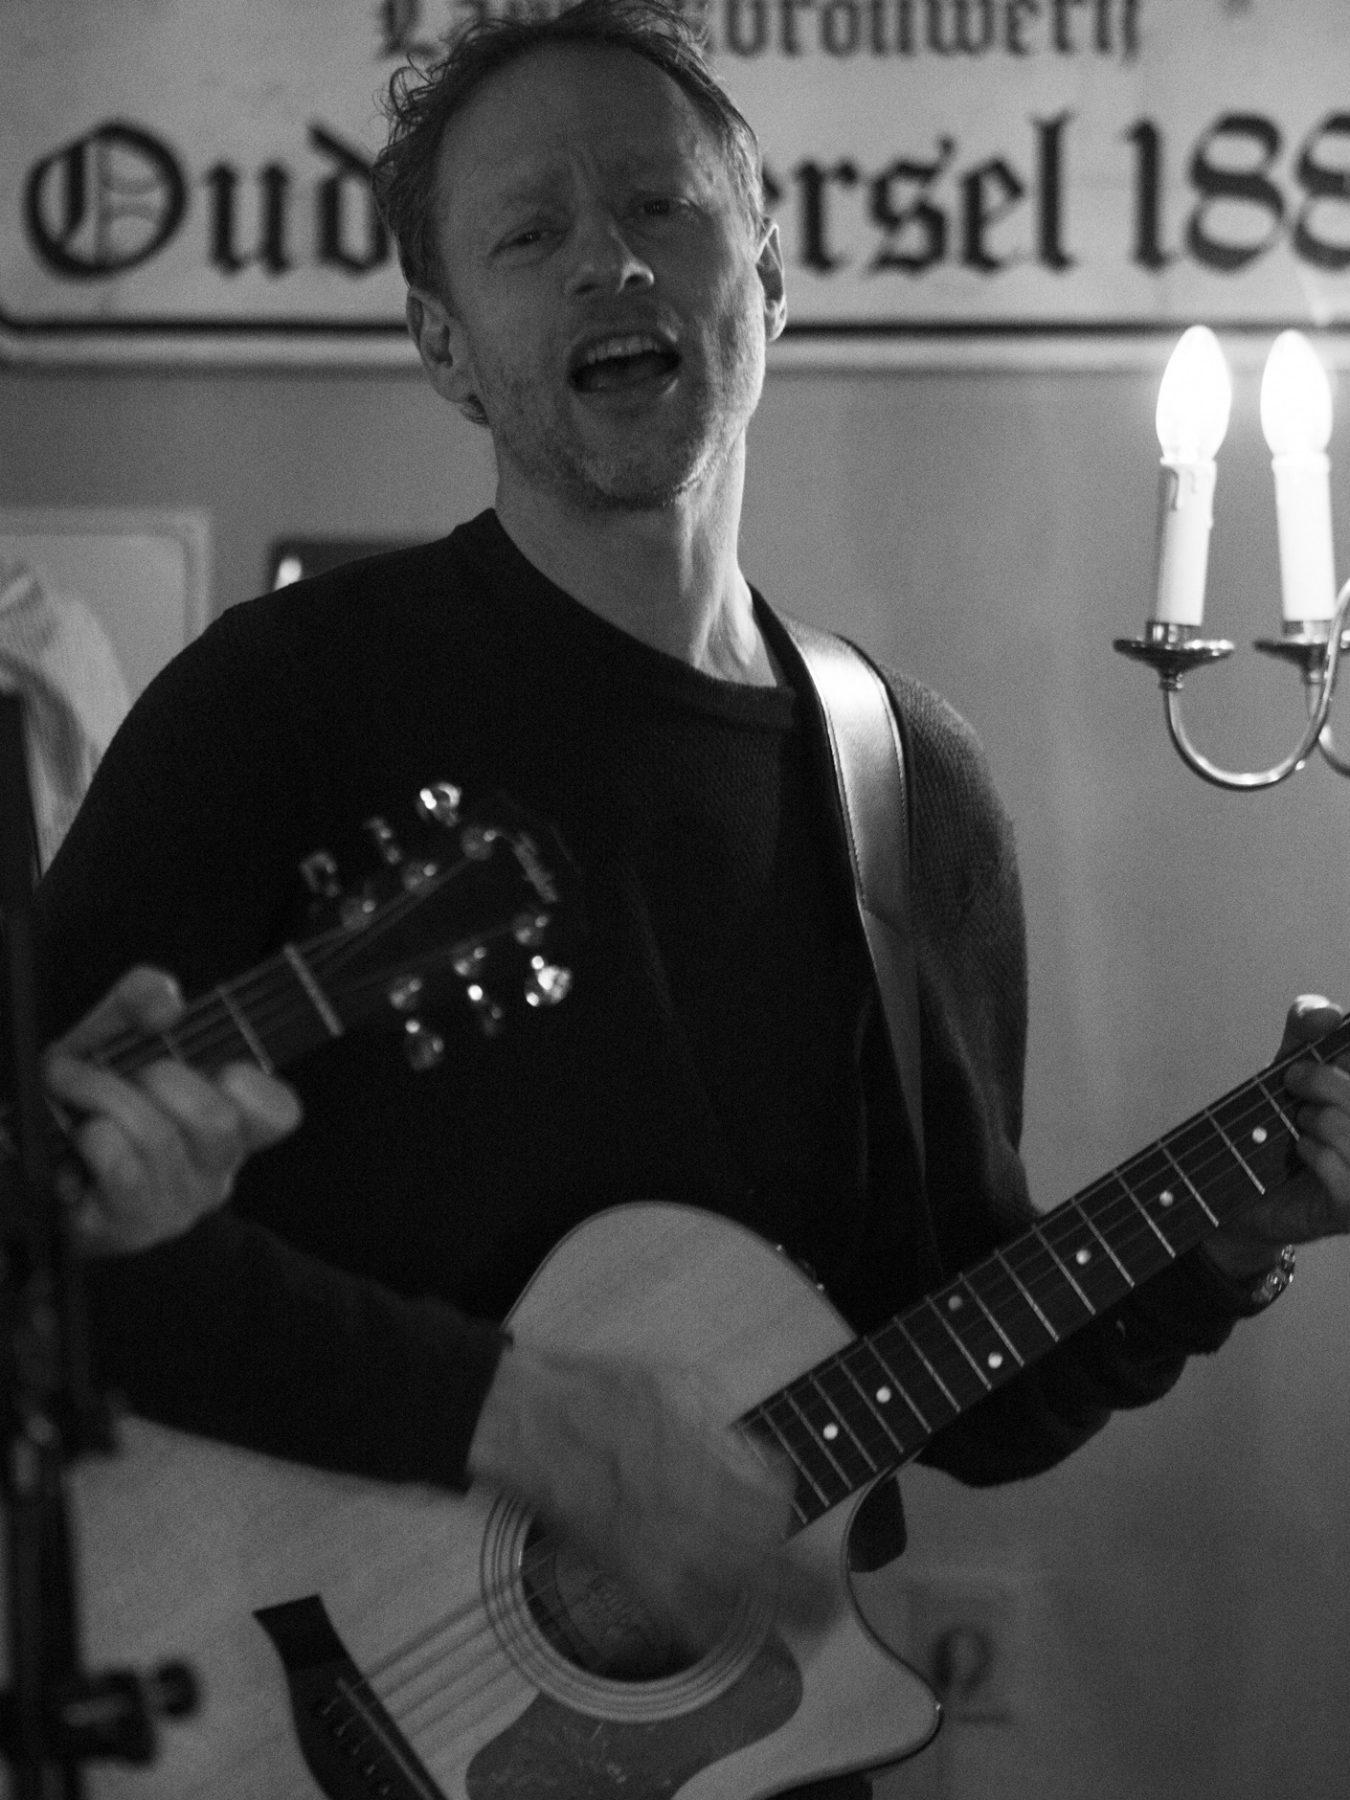 Olav Frølich fra Hund i Snor synger og spiller guitar